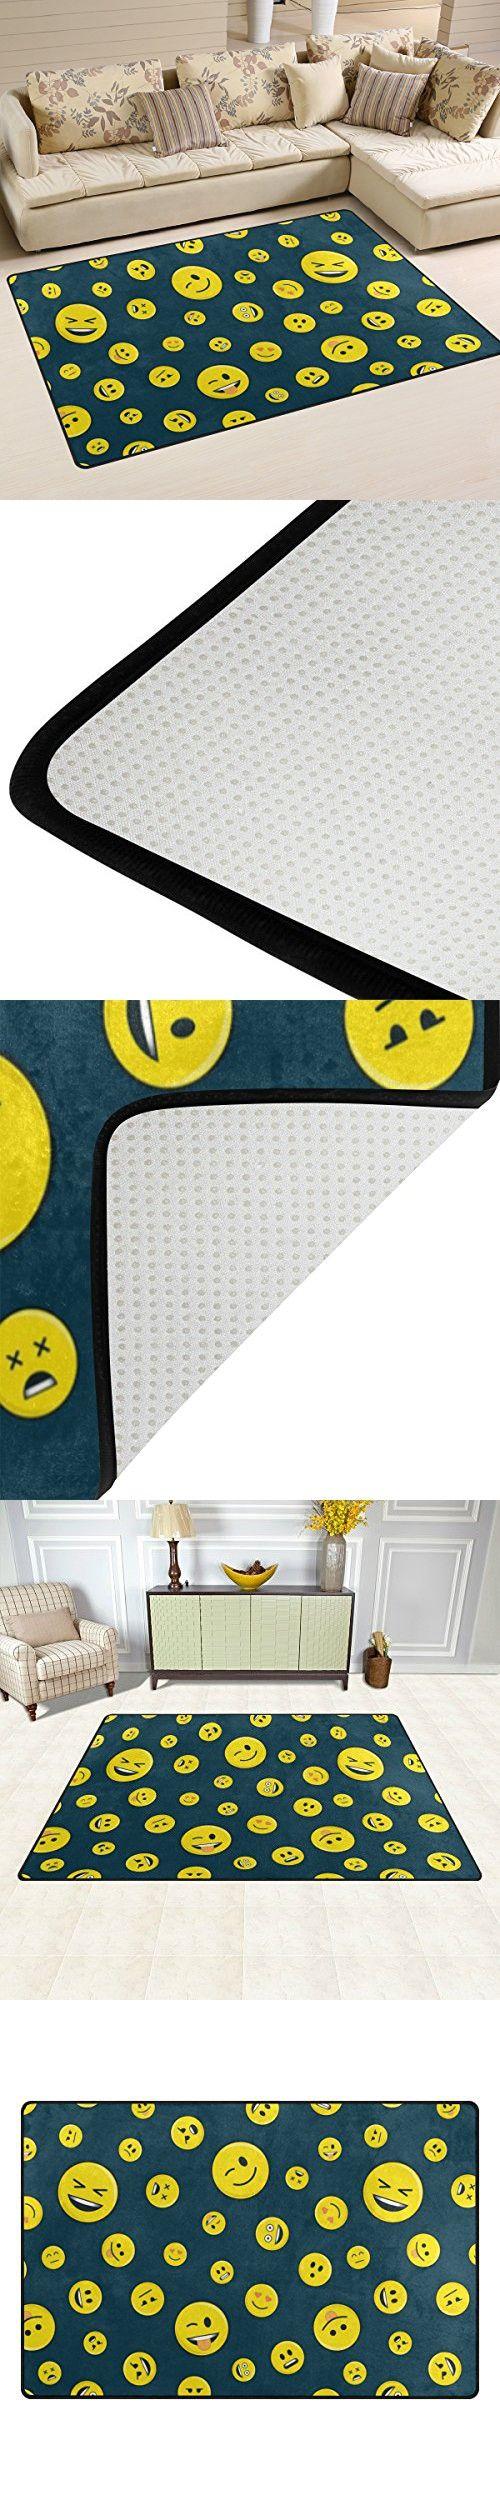 Yochoice Non-slip Area Rugs Home Decor, Hipster Funny Cute Smiley Emoji Emoticon Face Floor Mat Living Room Bedroom Carpets Doormats 60 x 39 inches